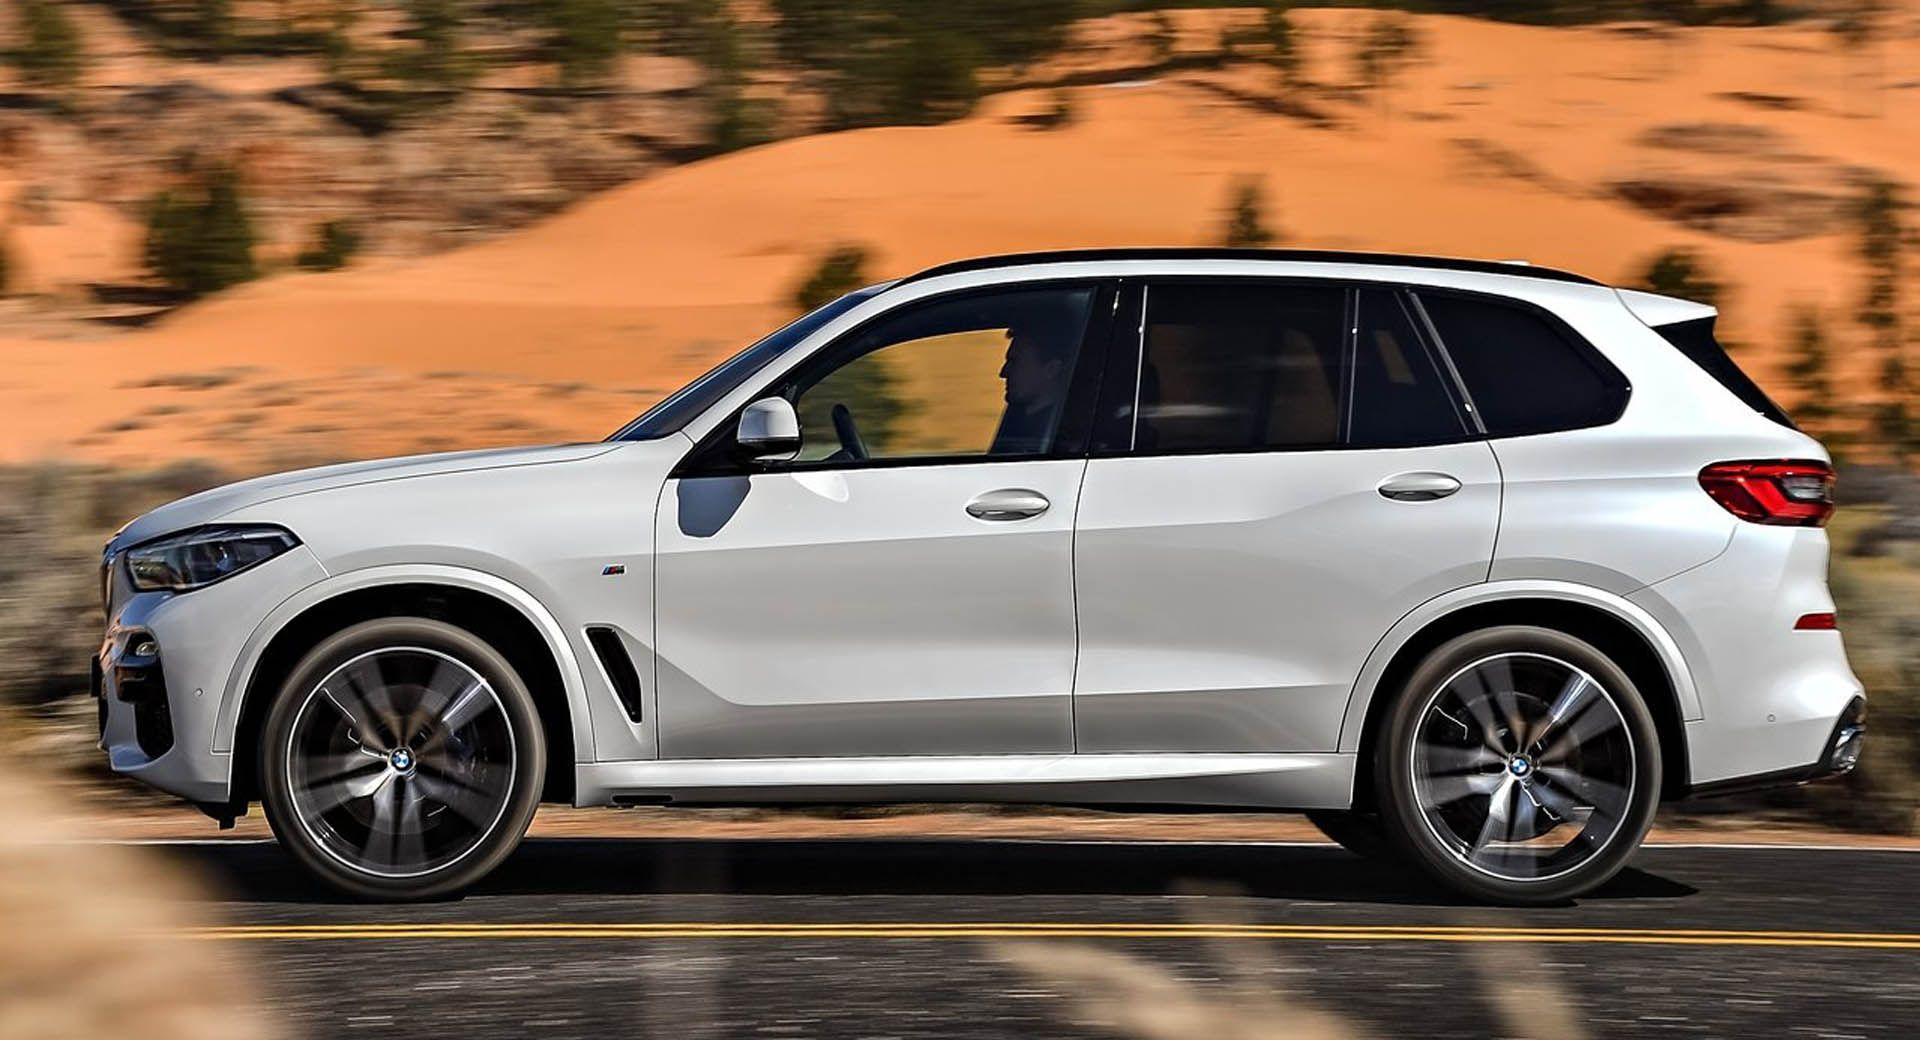 BMW-X5-G05-2019-4.jpg